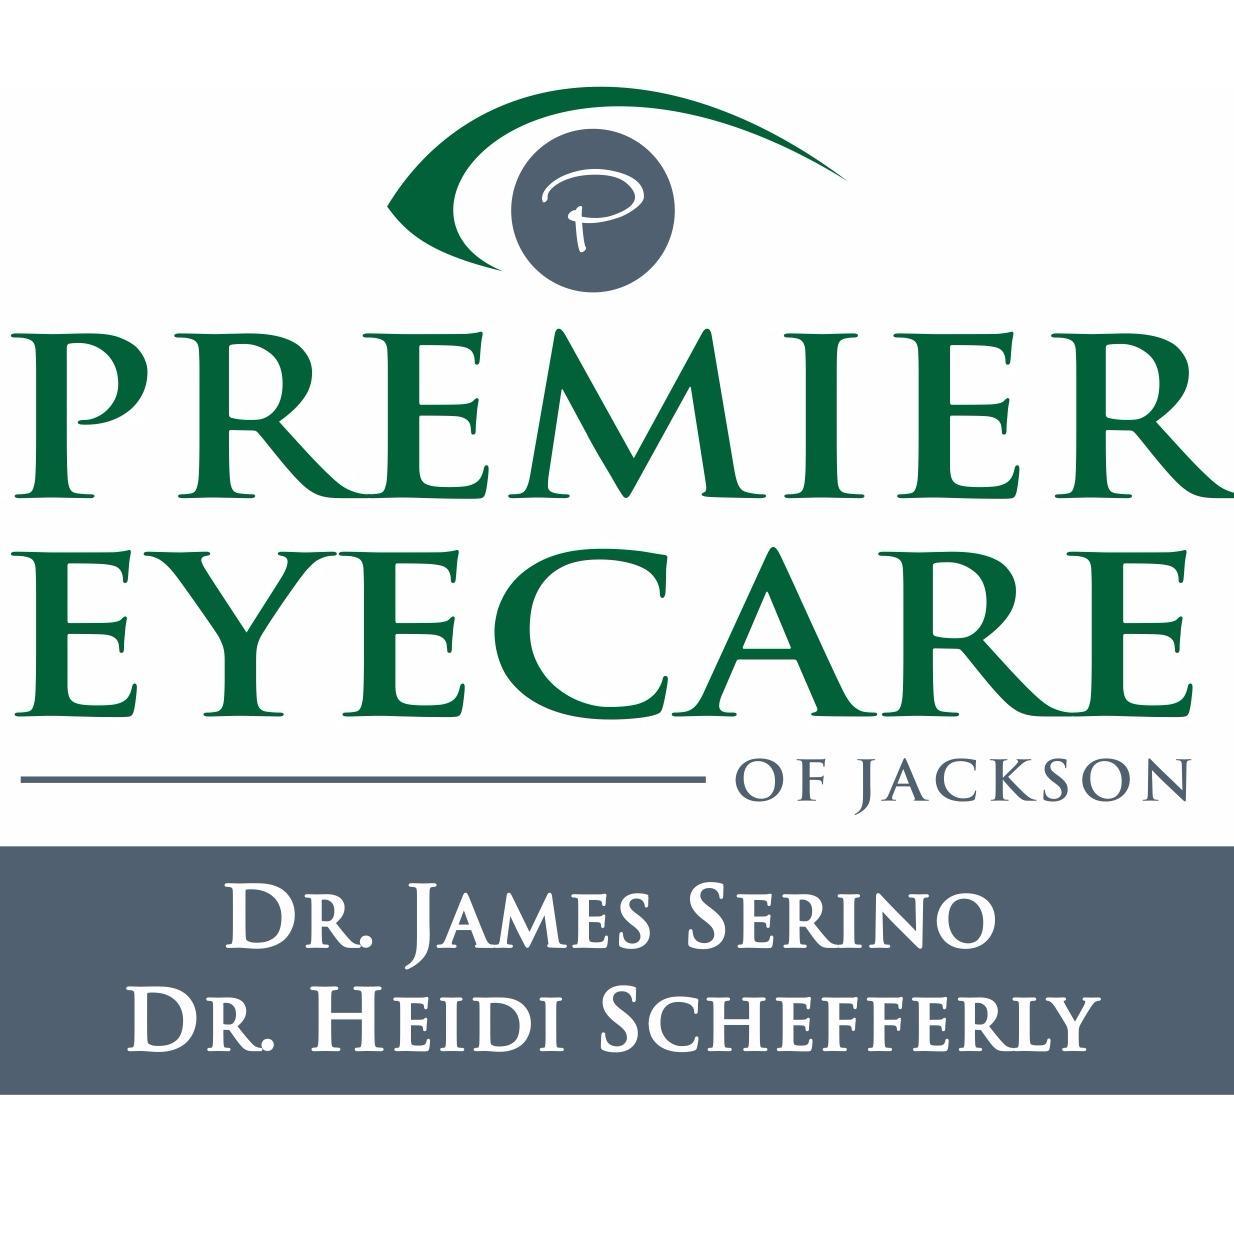 Premier Eyecare of Jackson